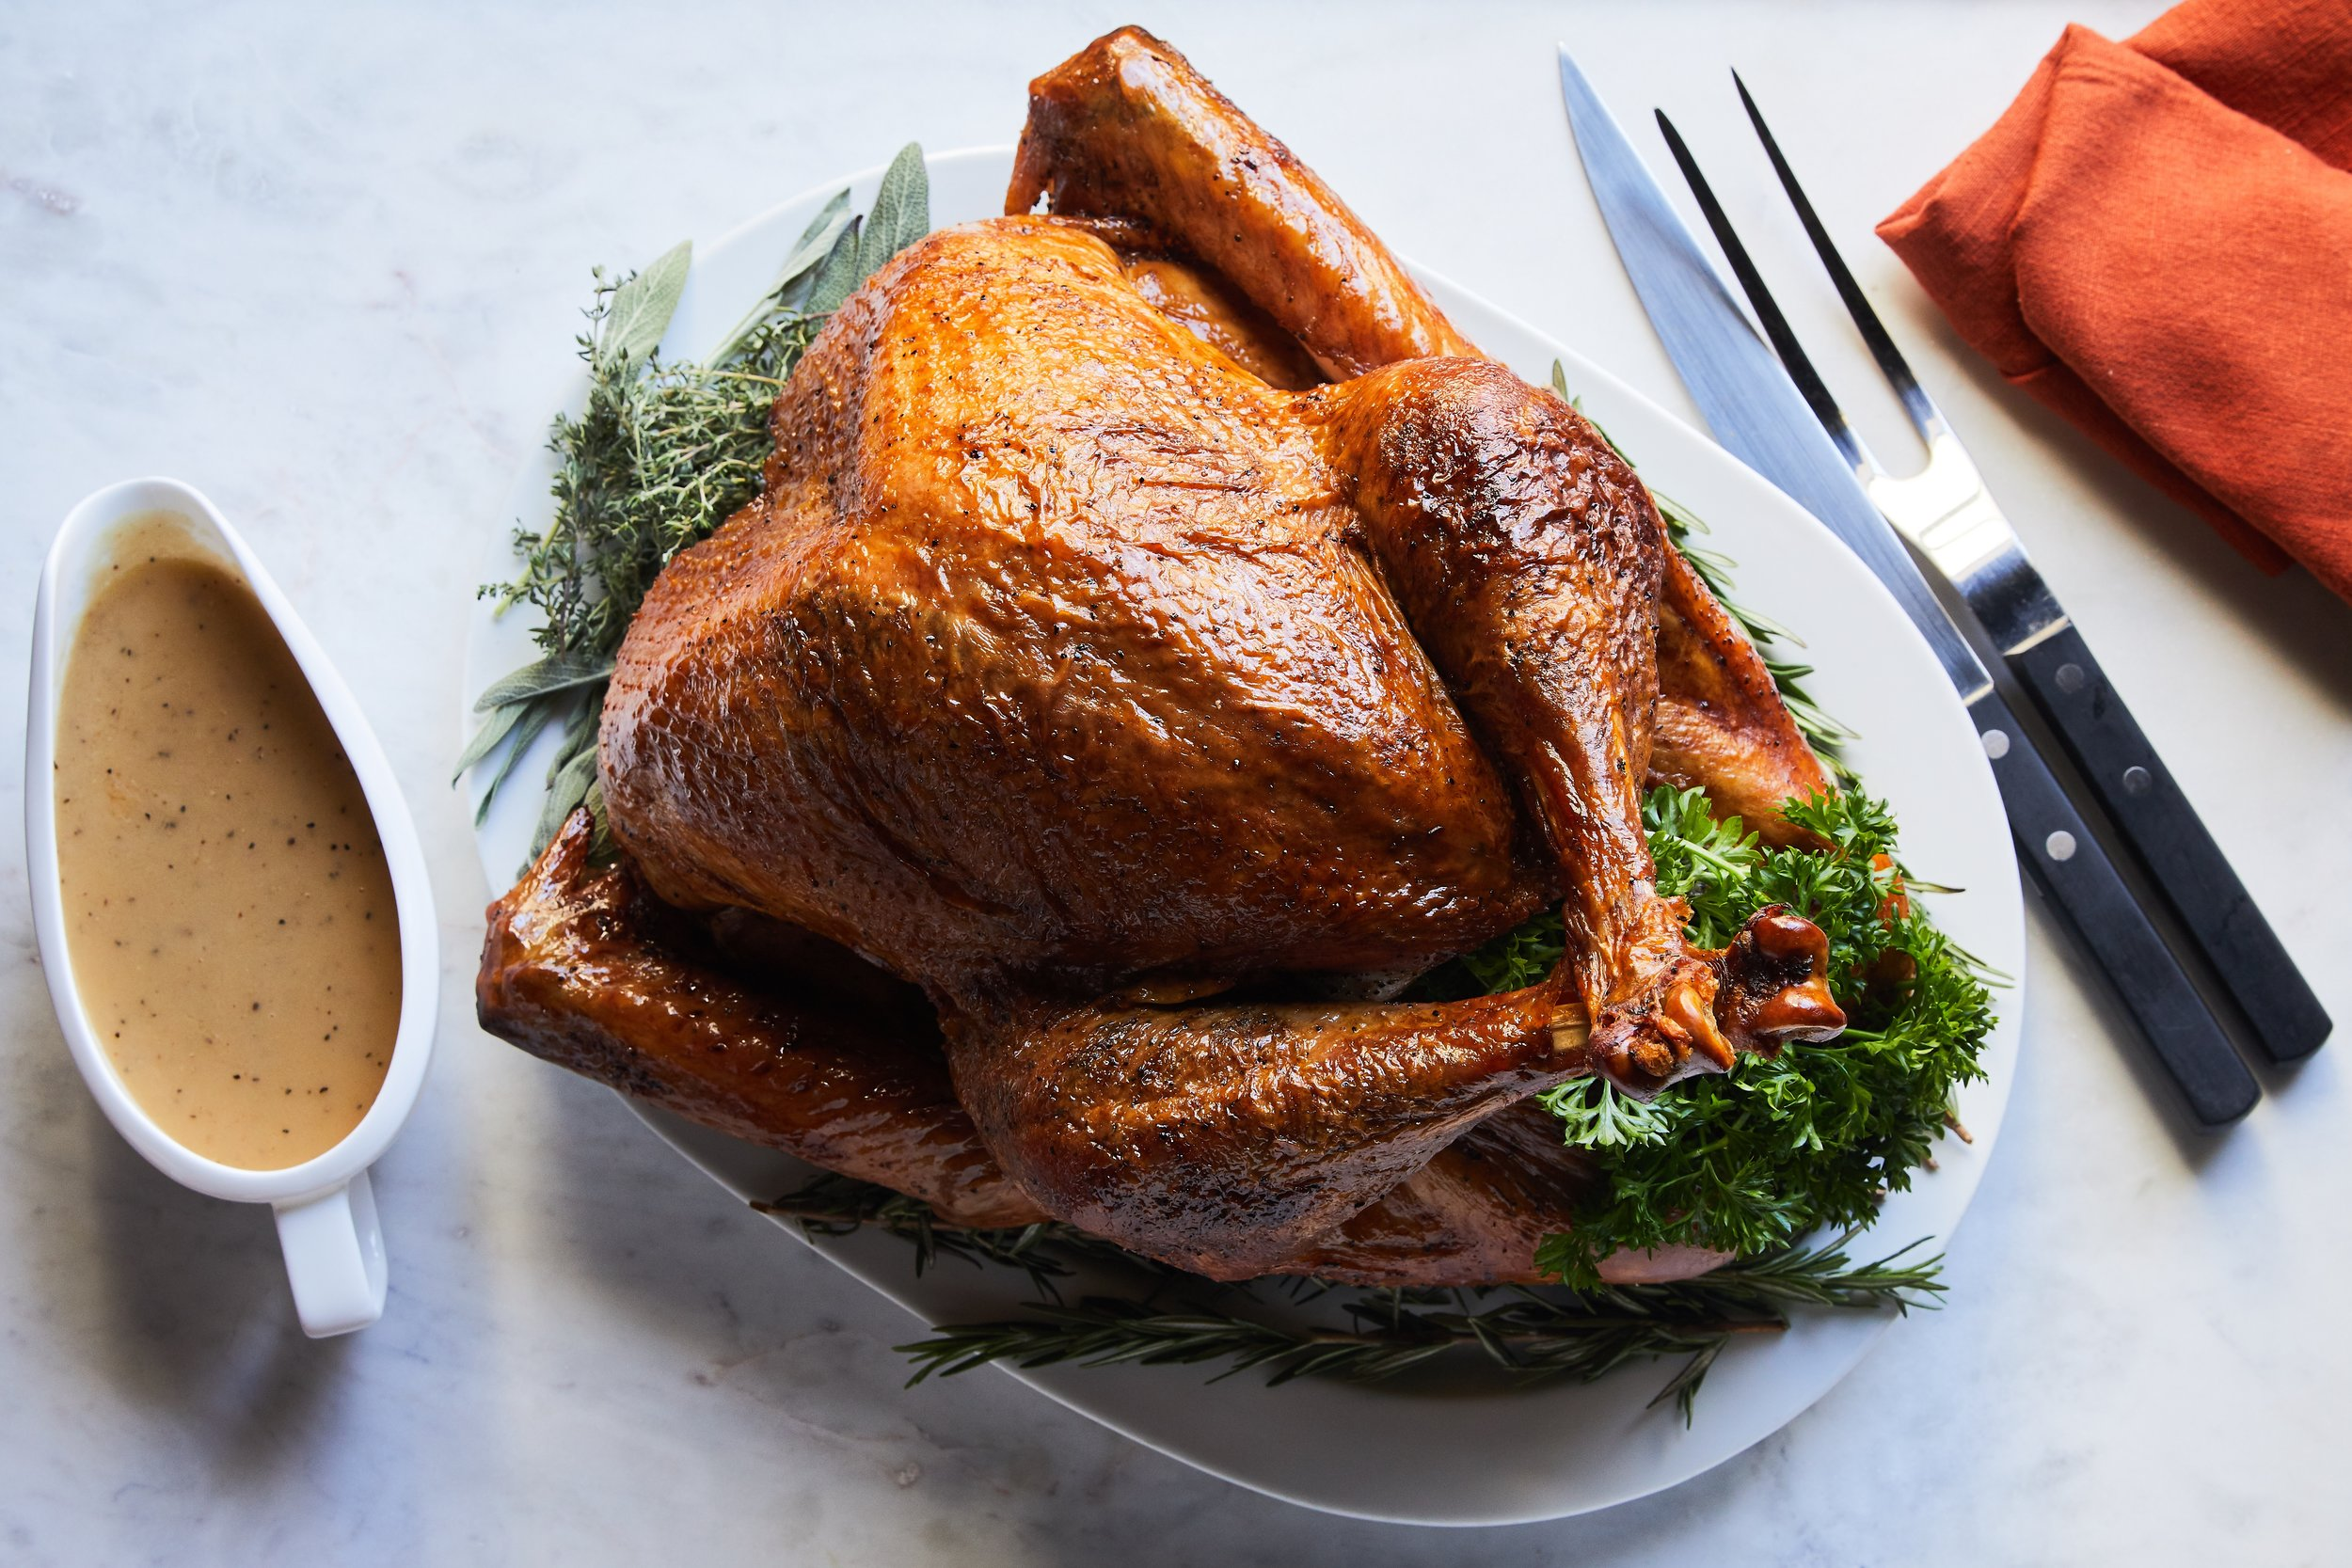 Roasted Turkey Wolfgang Puck 2 copy.jpg